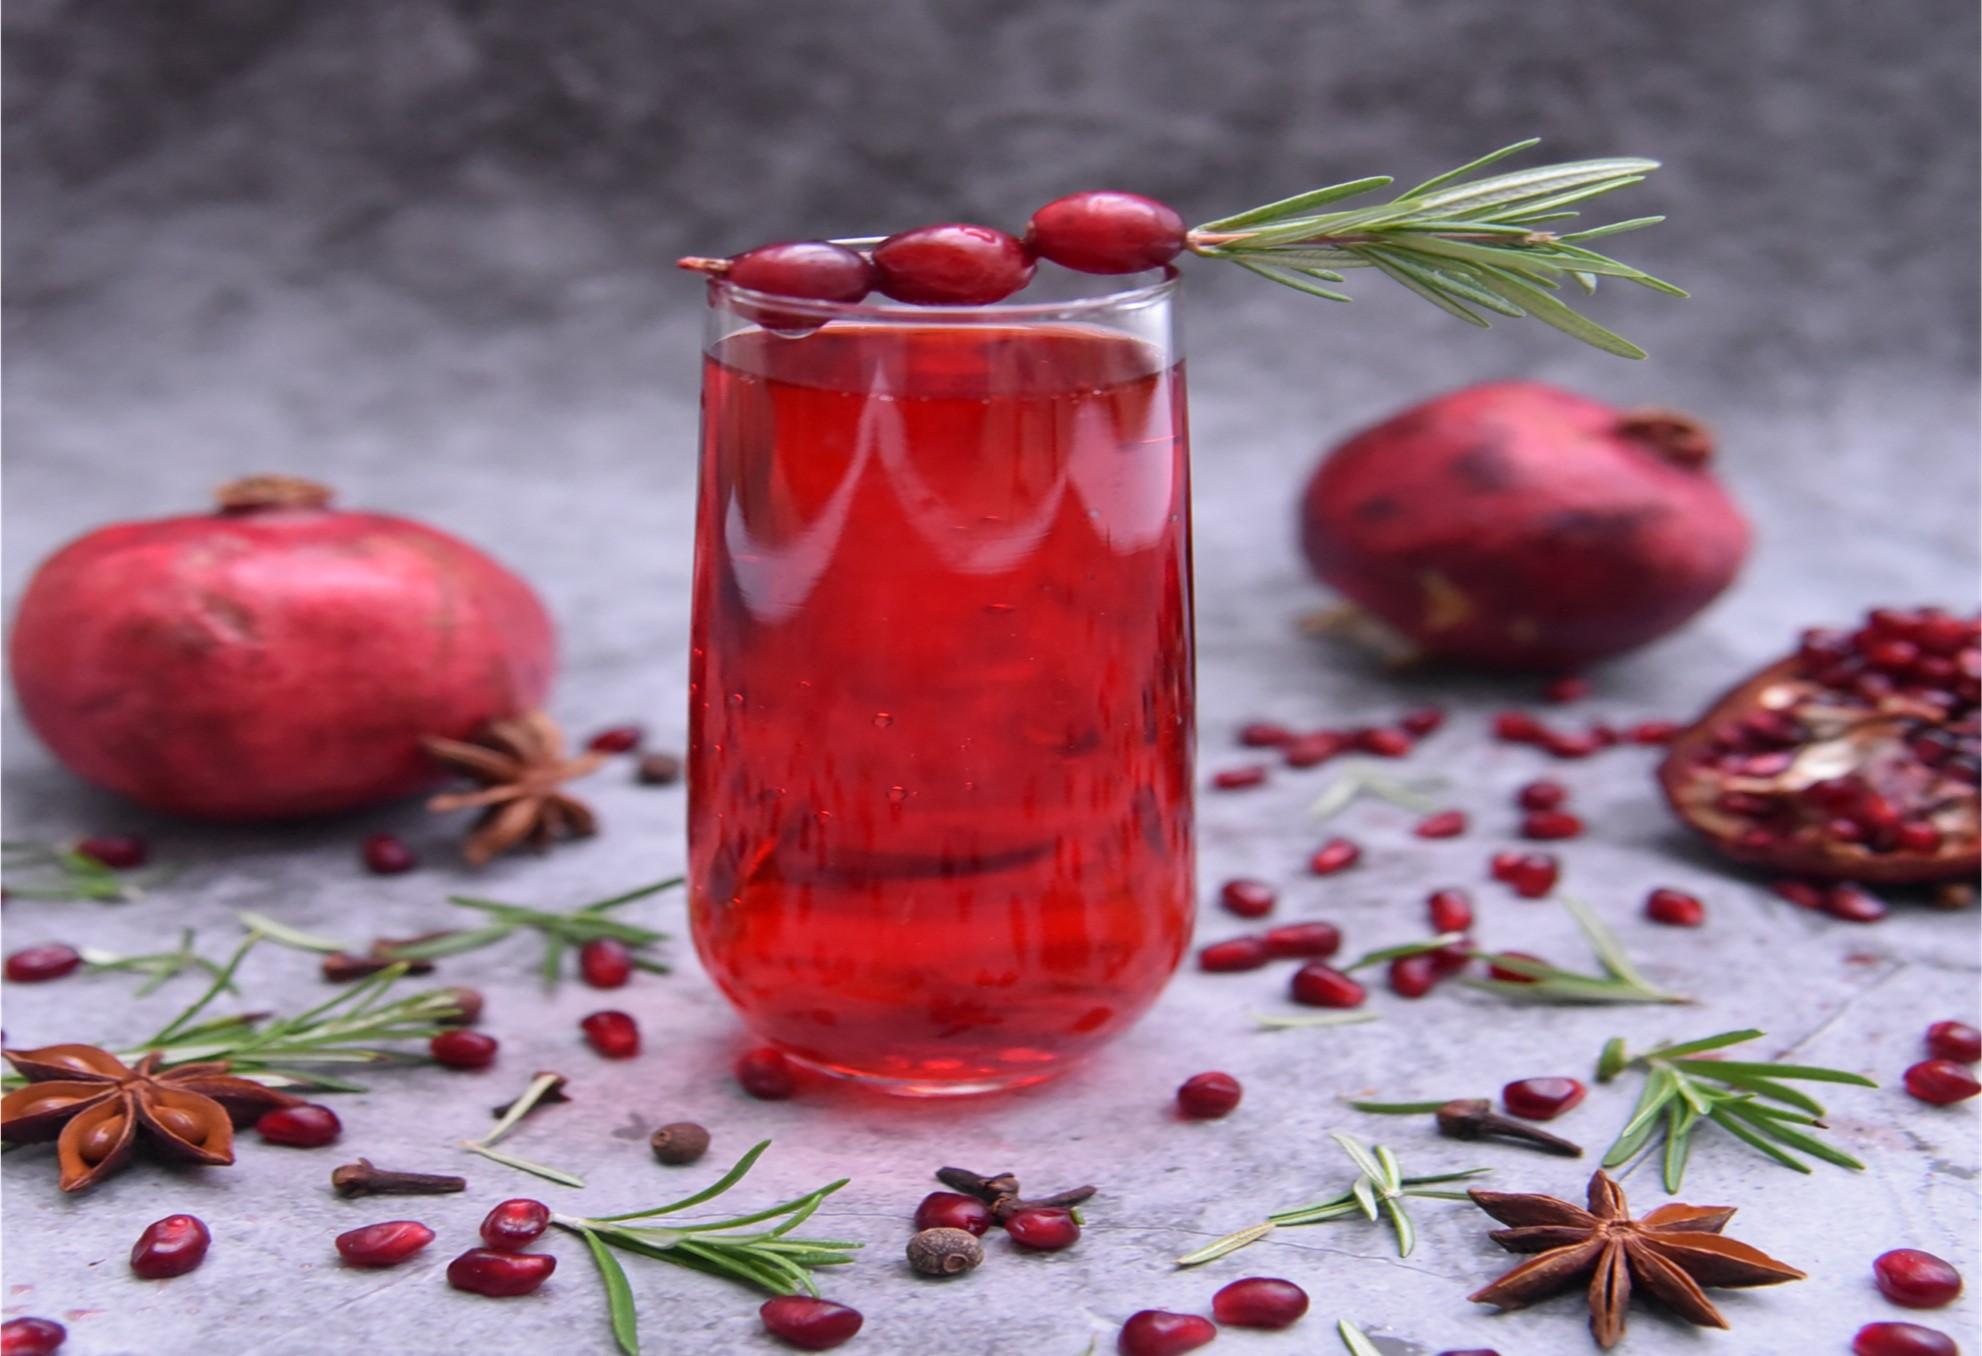 Cranberry-infused Kombucha